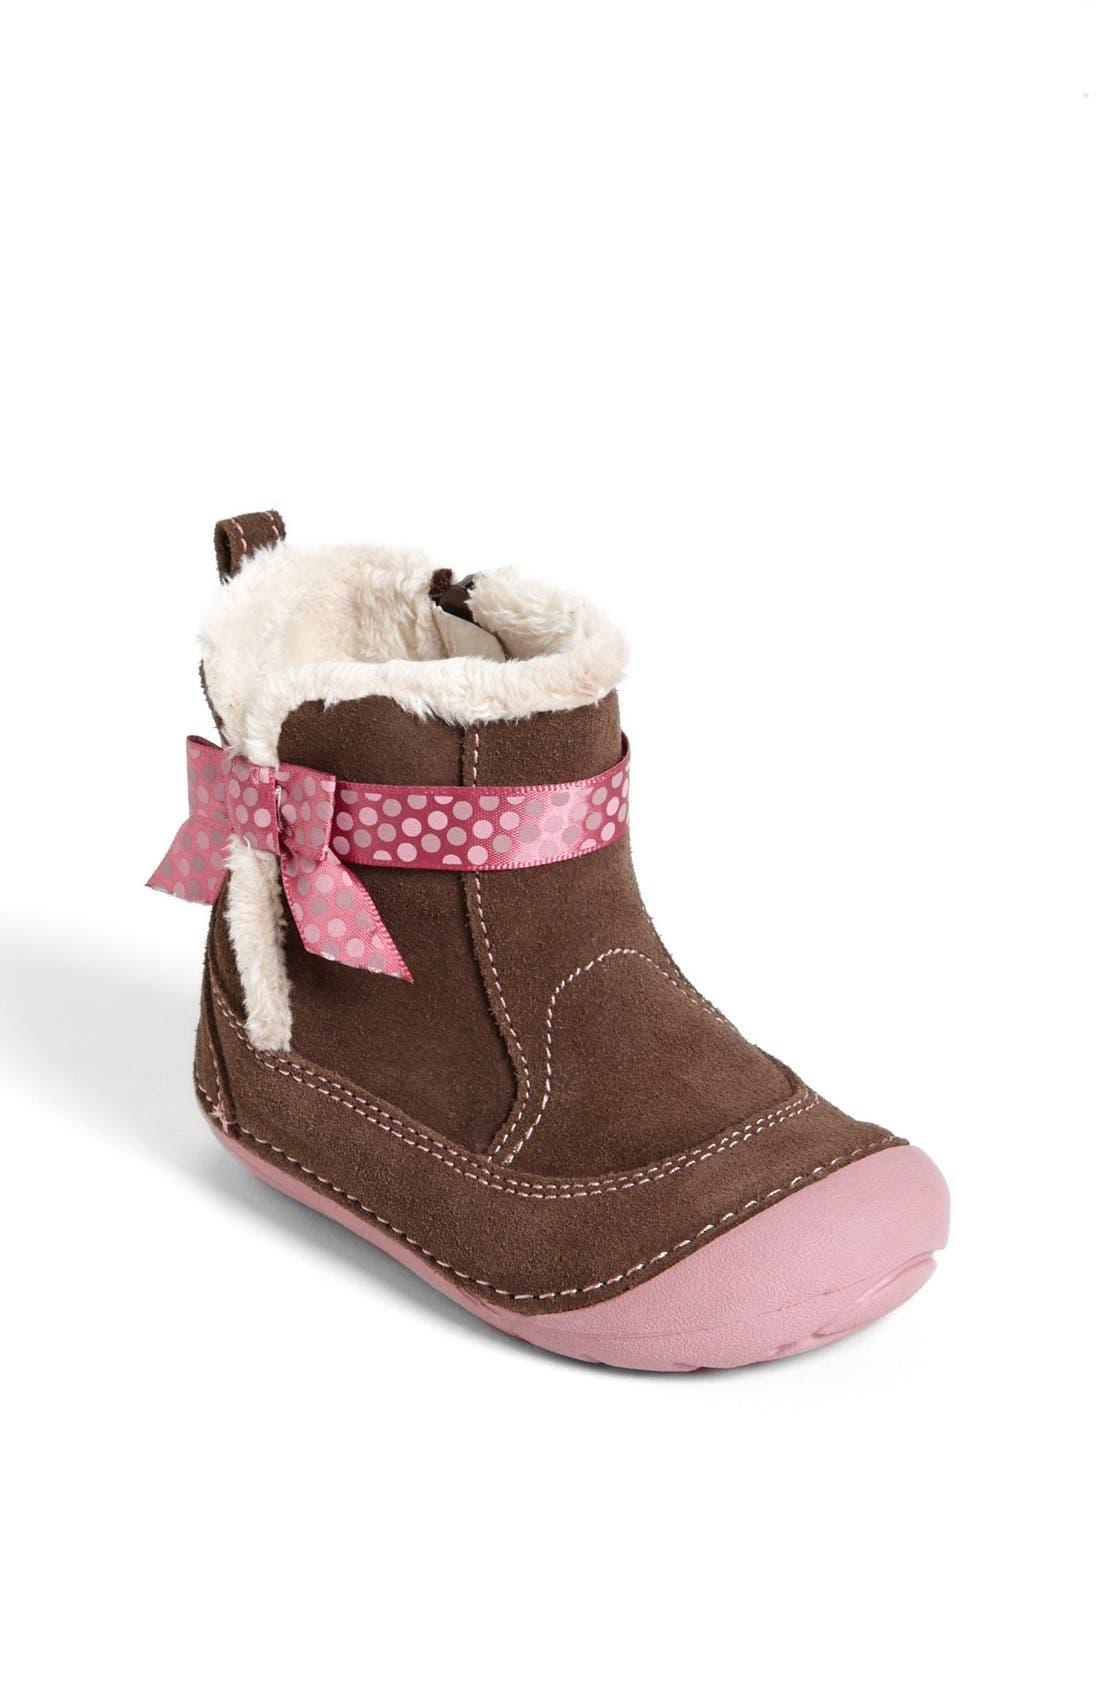 Main Image - Stride Rite 'Gellar' Boot (Baby & Walker)